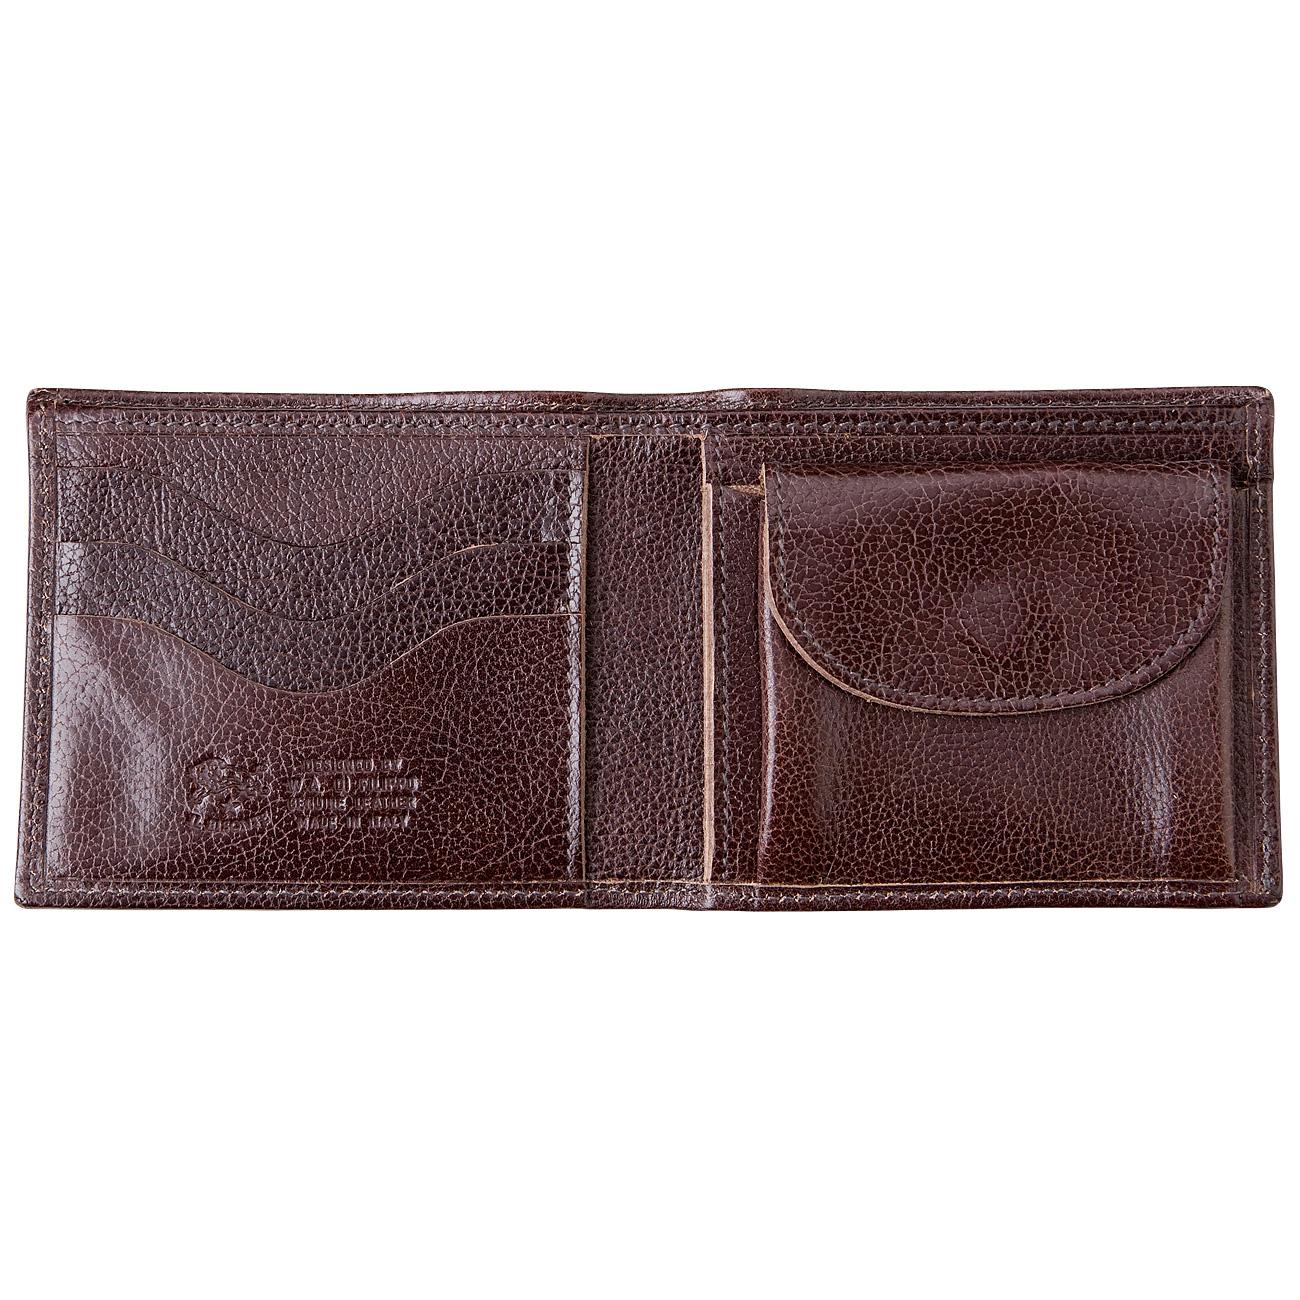 IL BISONTE (イル ビゾンテ) 日本公式オンラインストア 二つ折り財布 411853